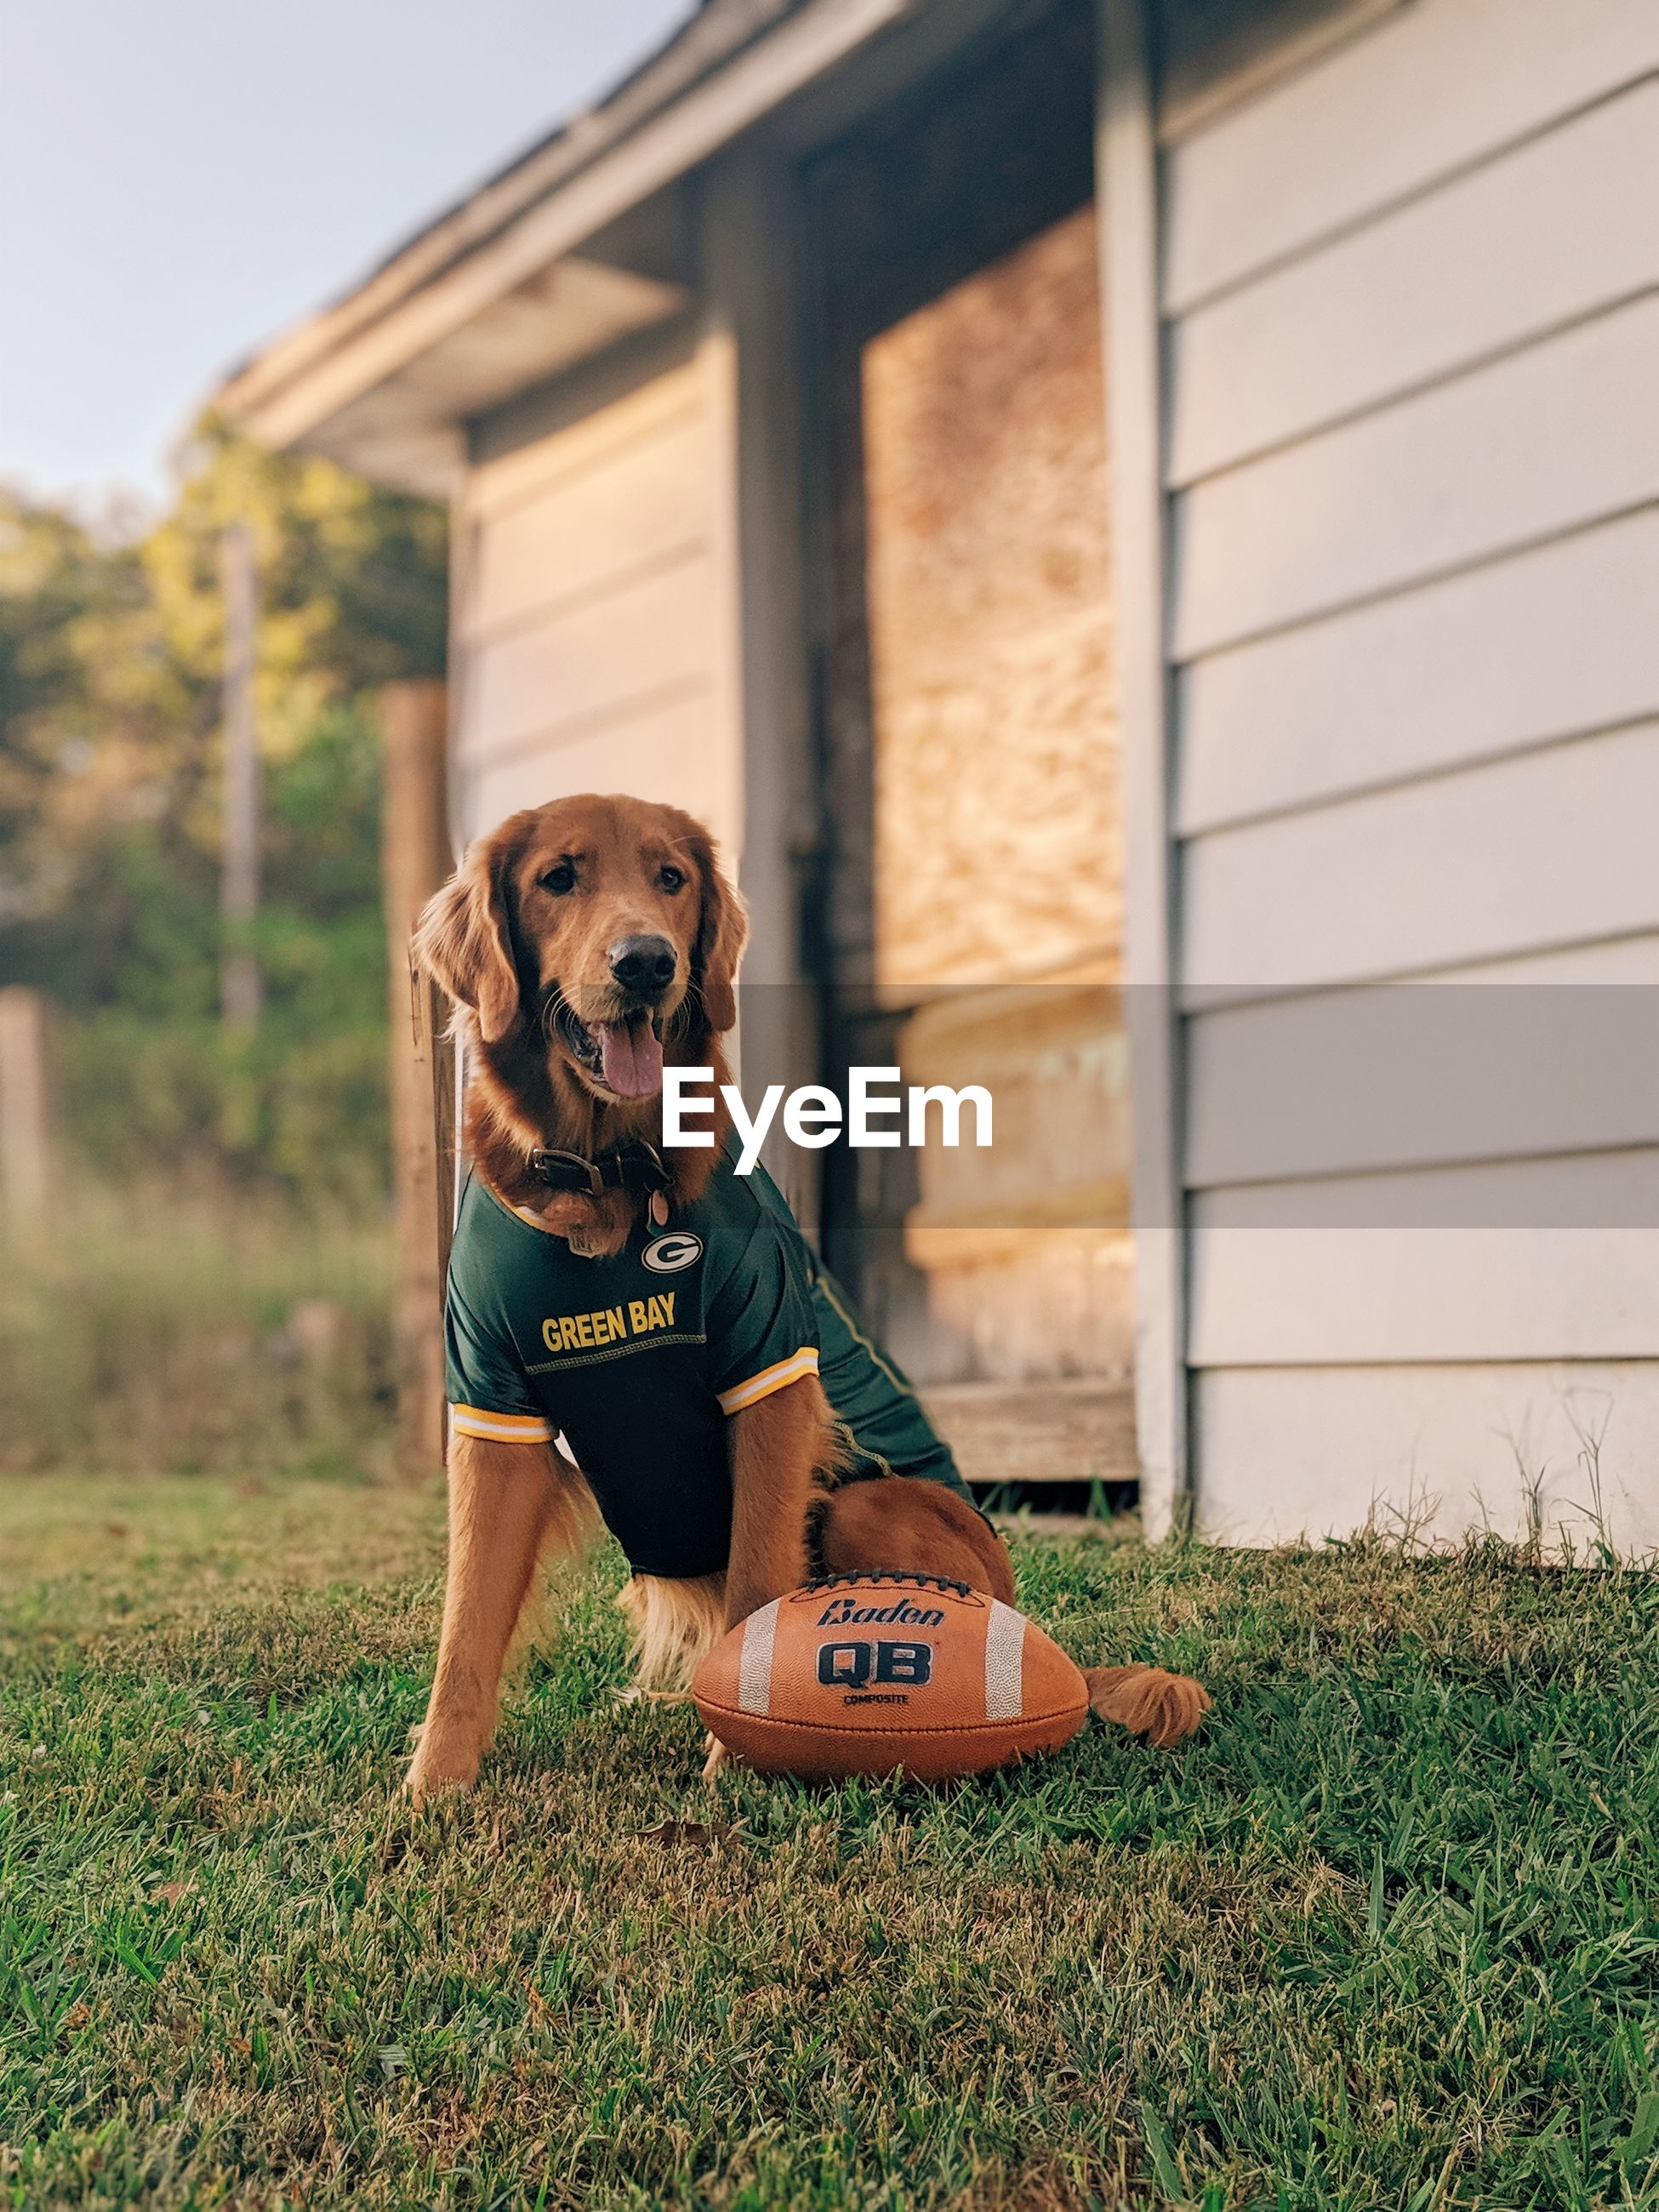 PORTRAIT OF DOG STANDING IN FIELD